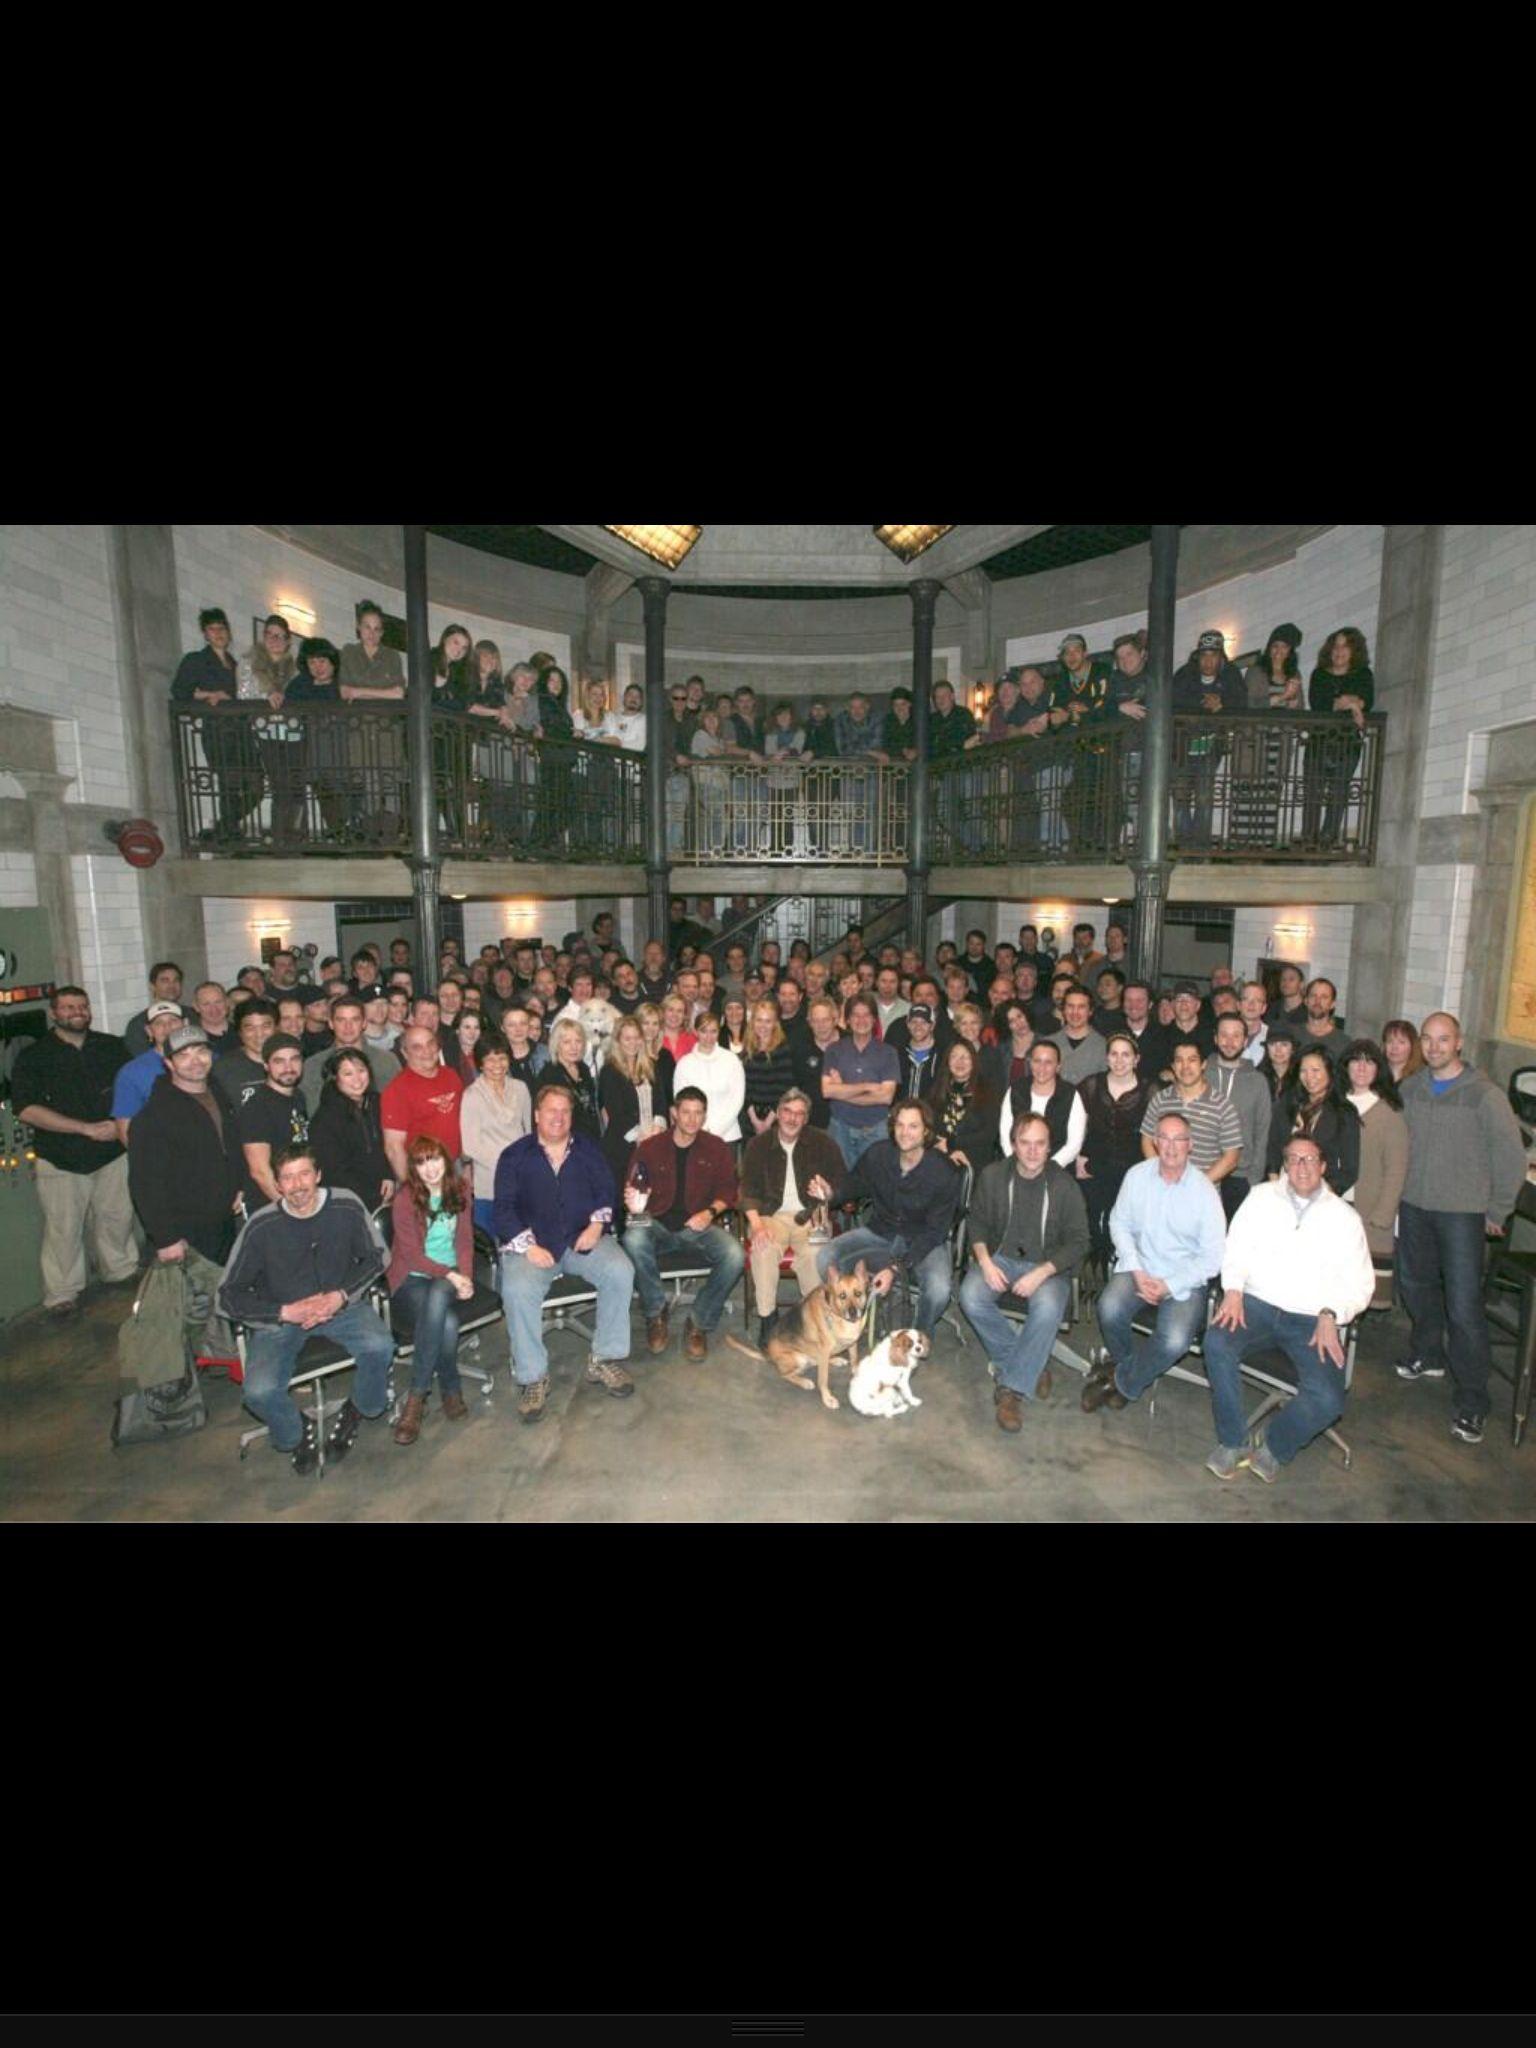 Season 8 Cast & Crew pic